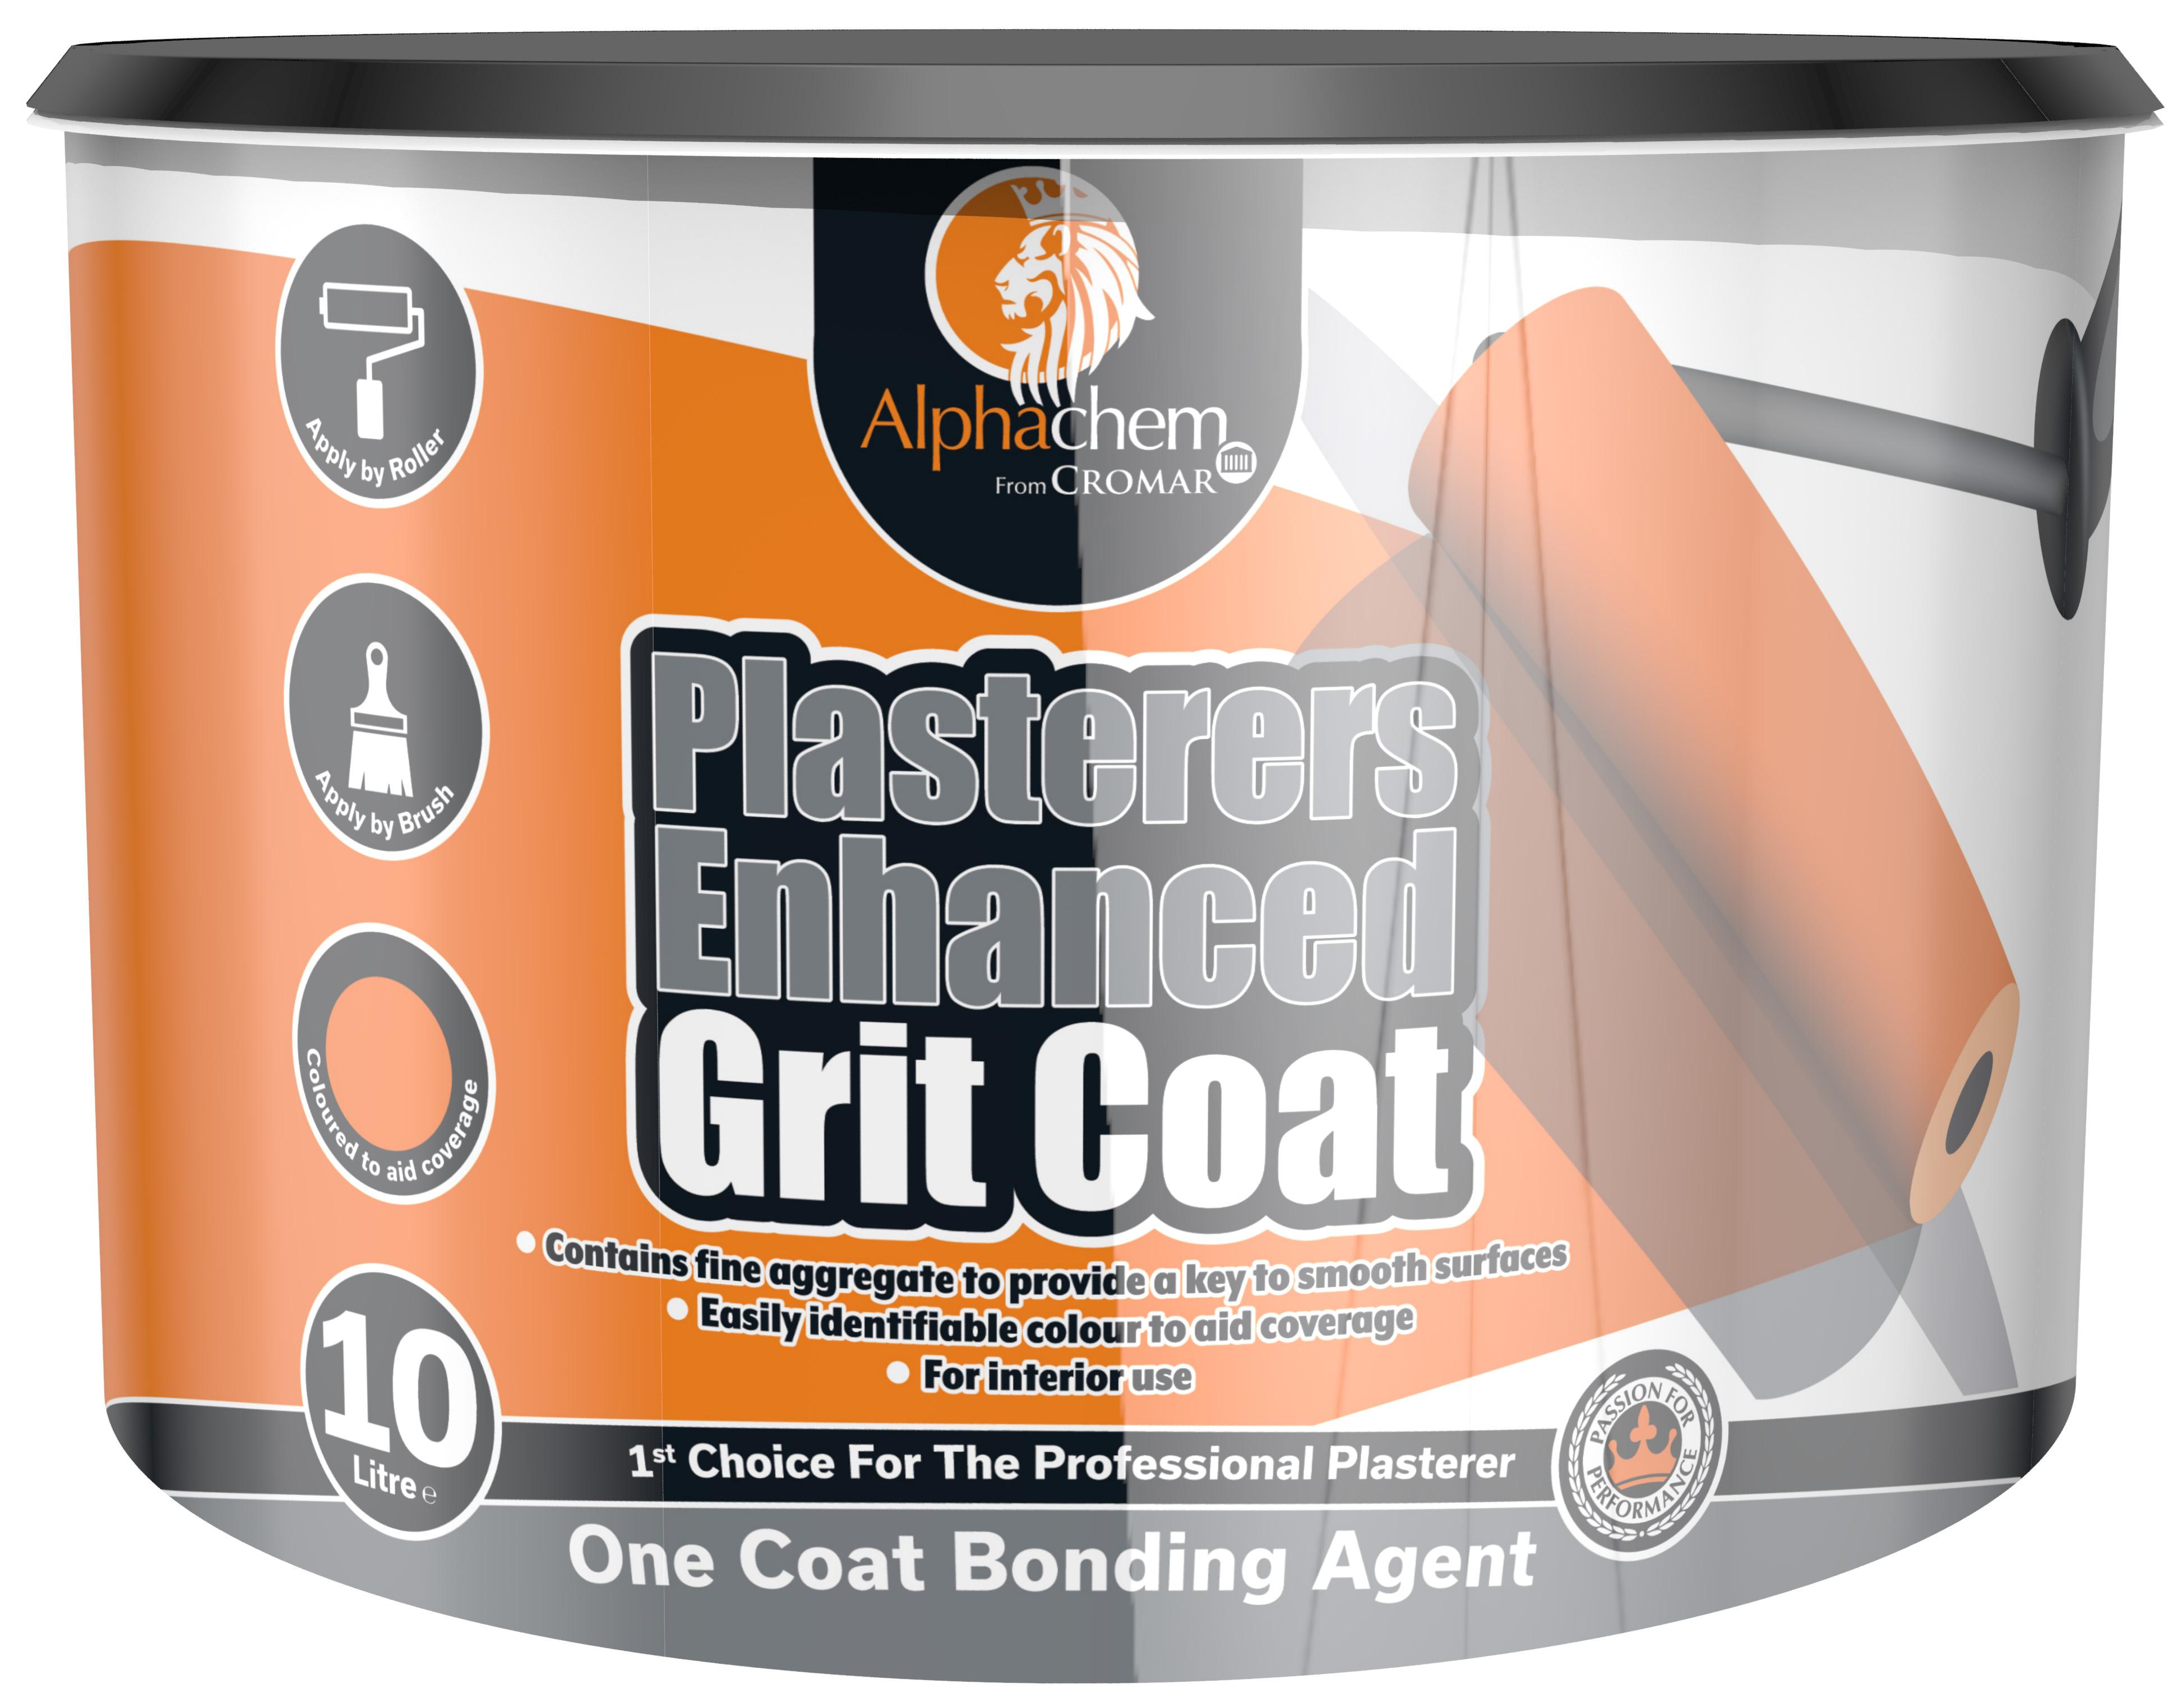 Plasterers' Grit Coat from AlphaChem